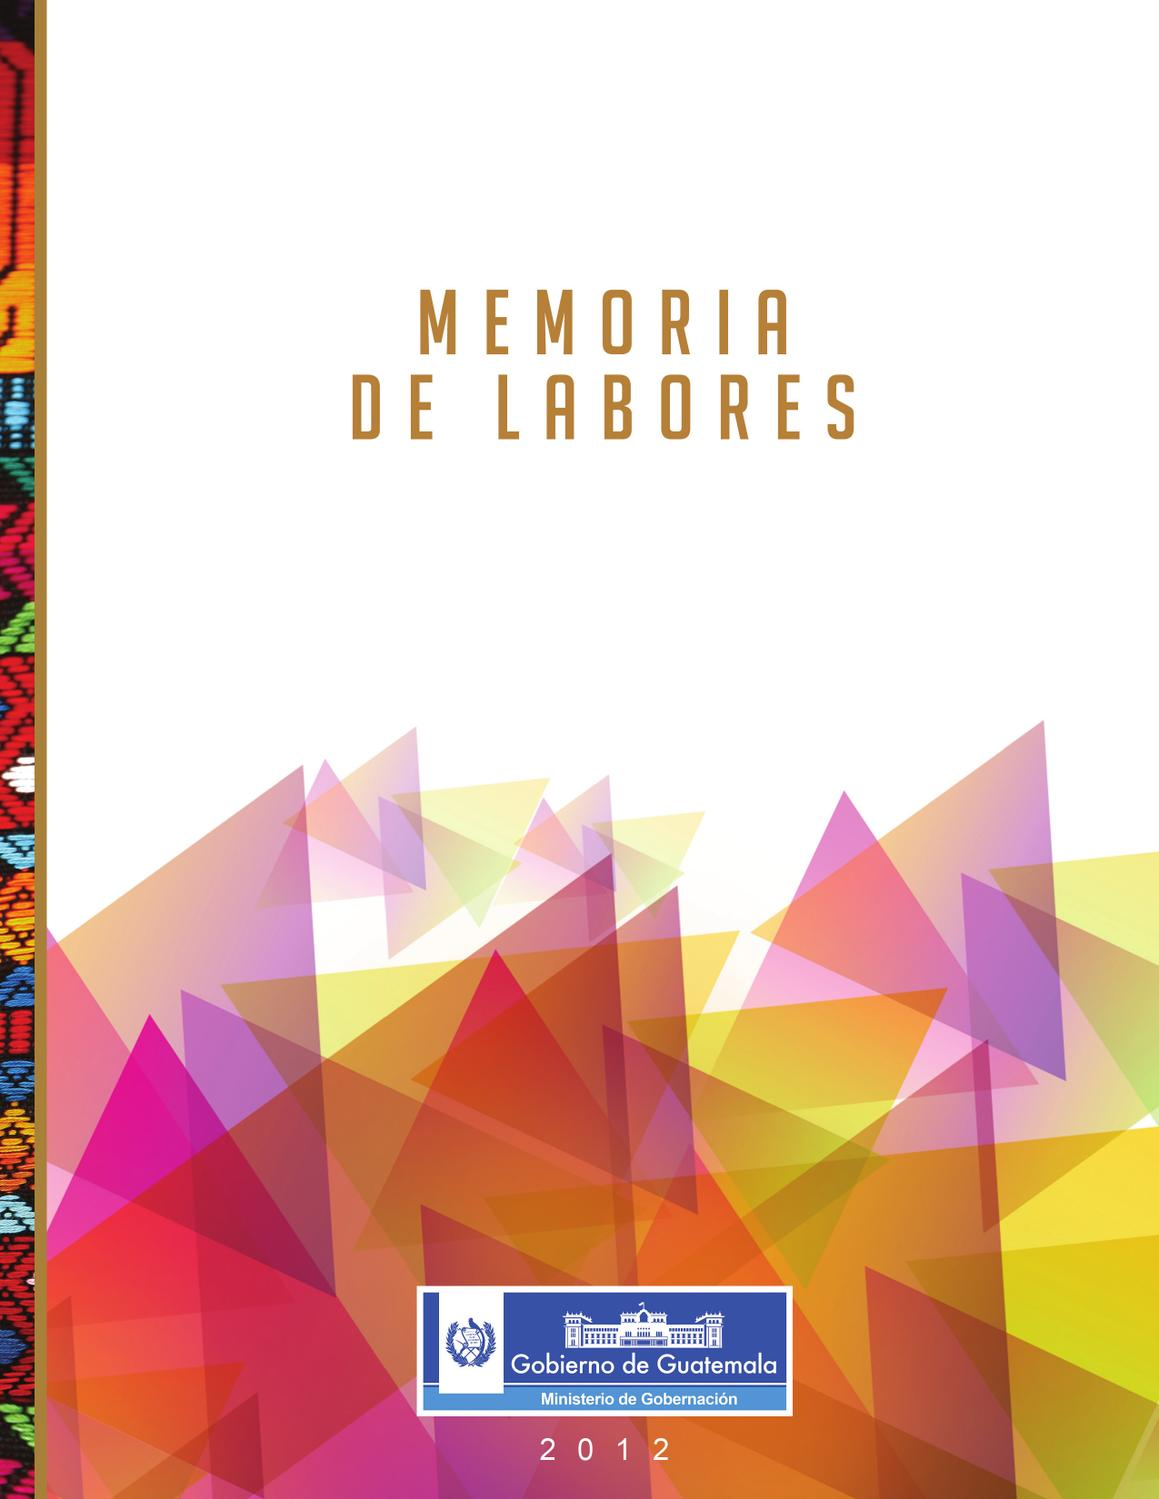 Memoria de labores 2012 del ministerio de gobernaci n by for Ministerio de gobernacion